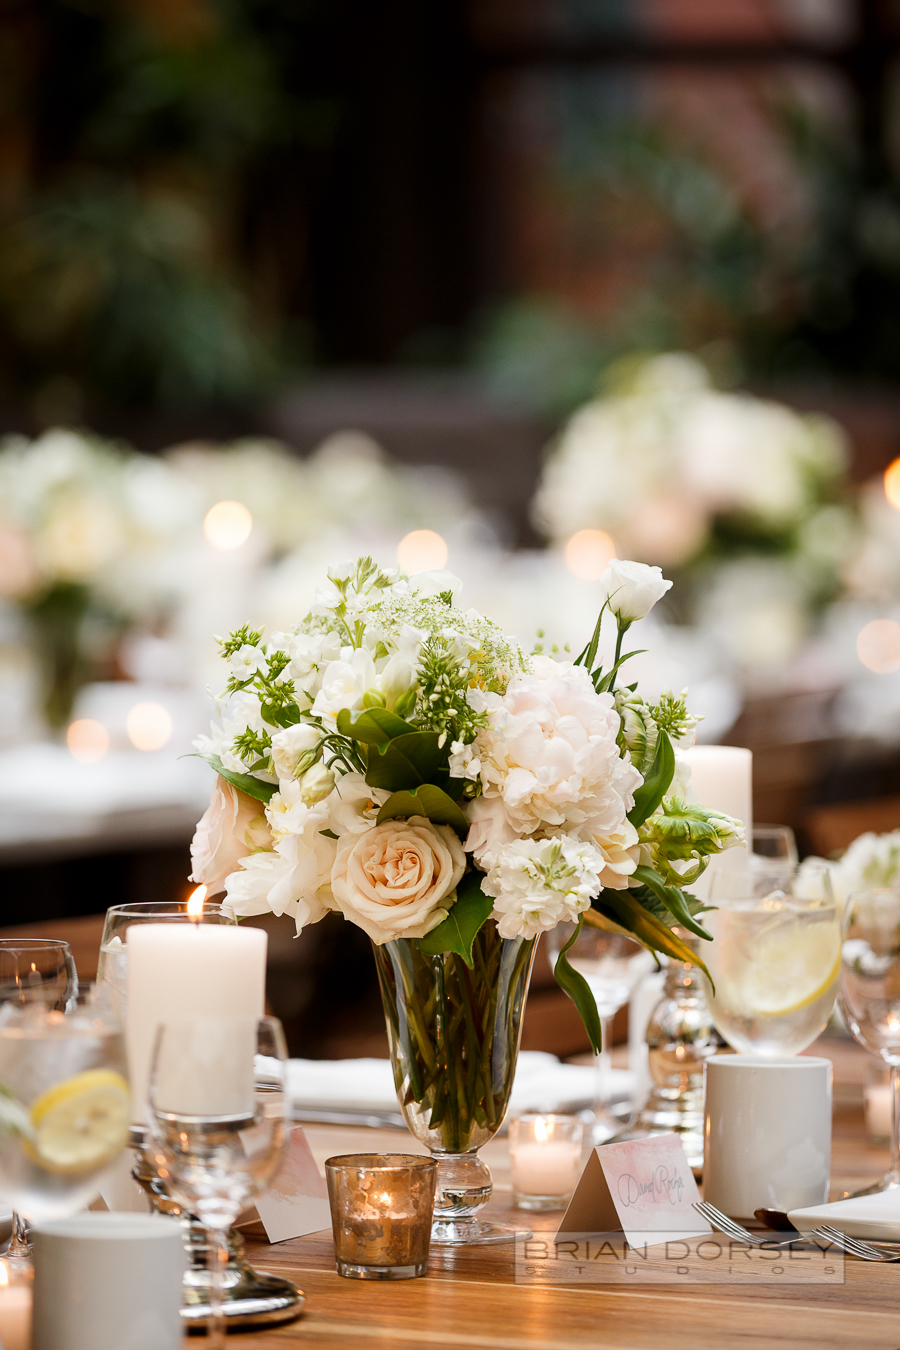 isola nomo soho hotel wedding brian dorsey studios ang weddings and events-30.jpg